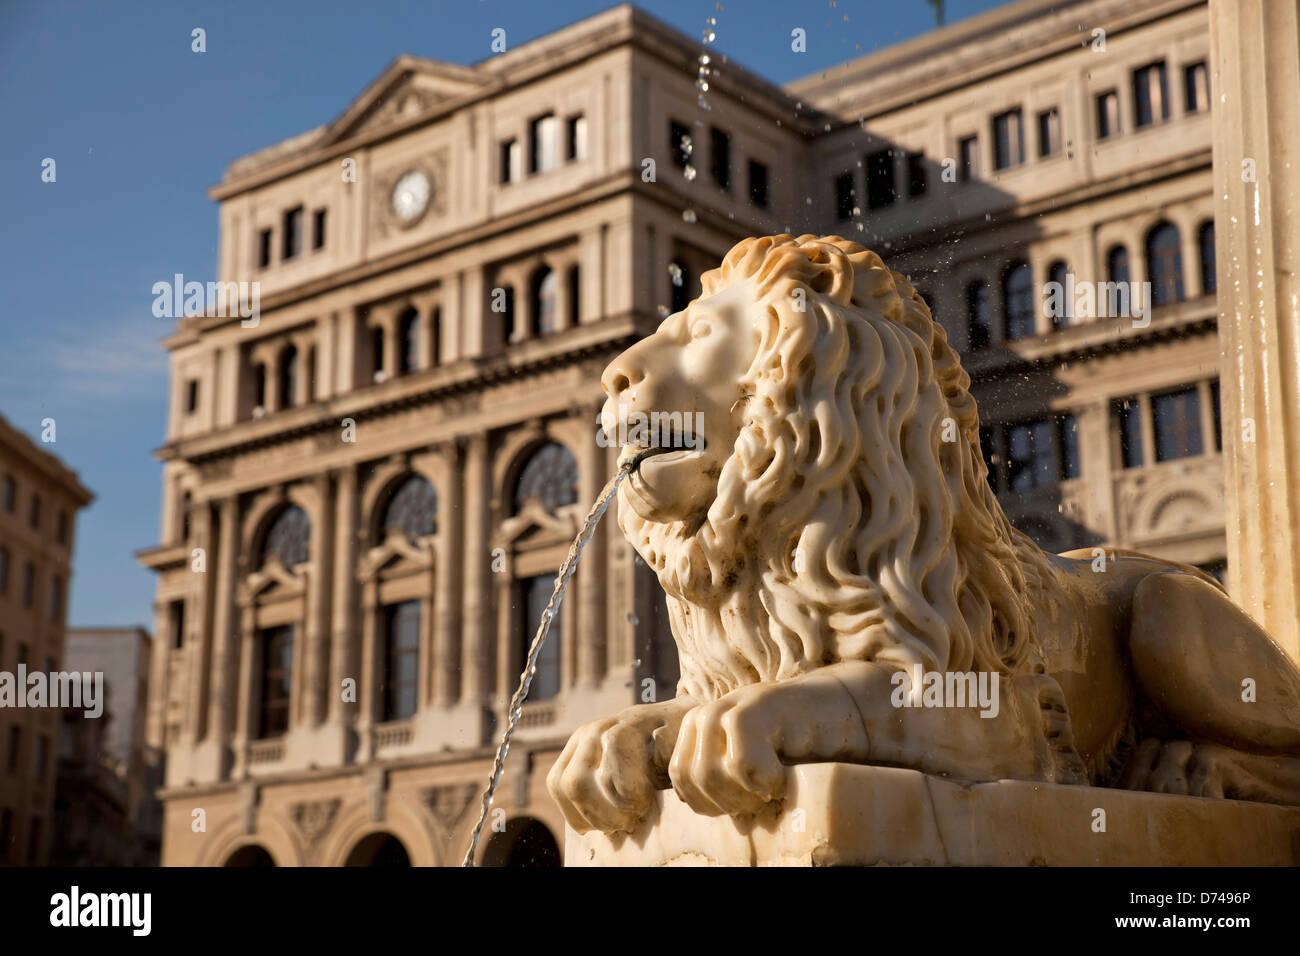 Lonja del Comercio in Havanna, Kuba, Karibik | Marmor Löwe aus dem Brunnen Fuente de Los Leones und Havanna Stockbild